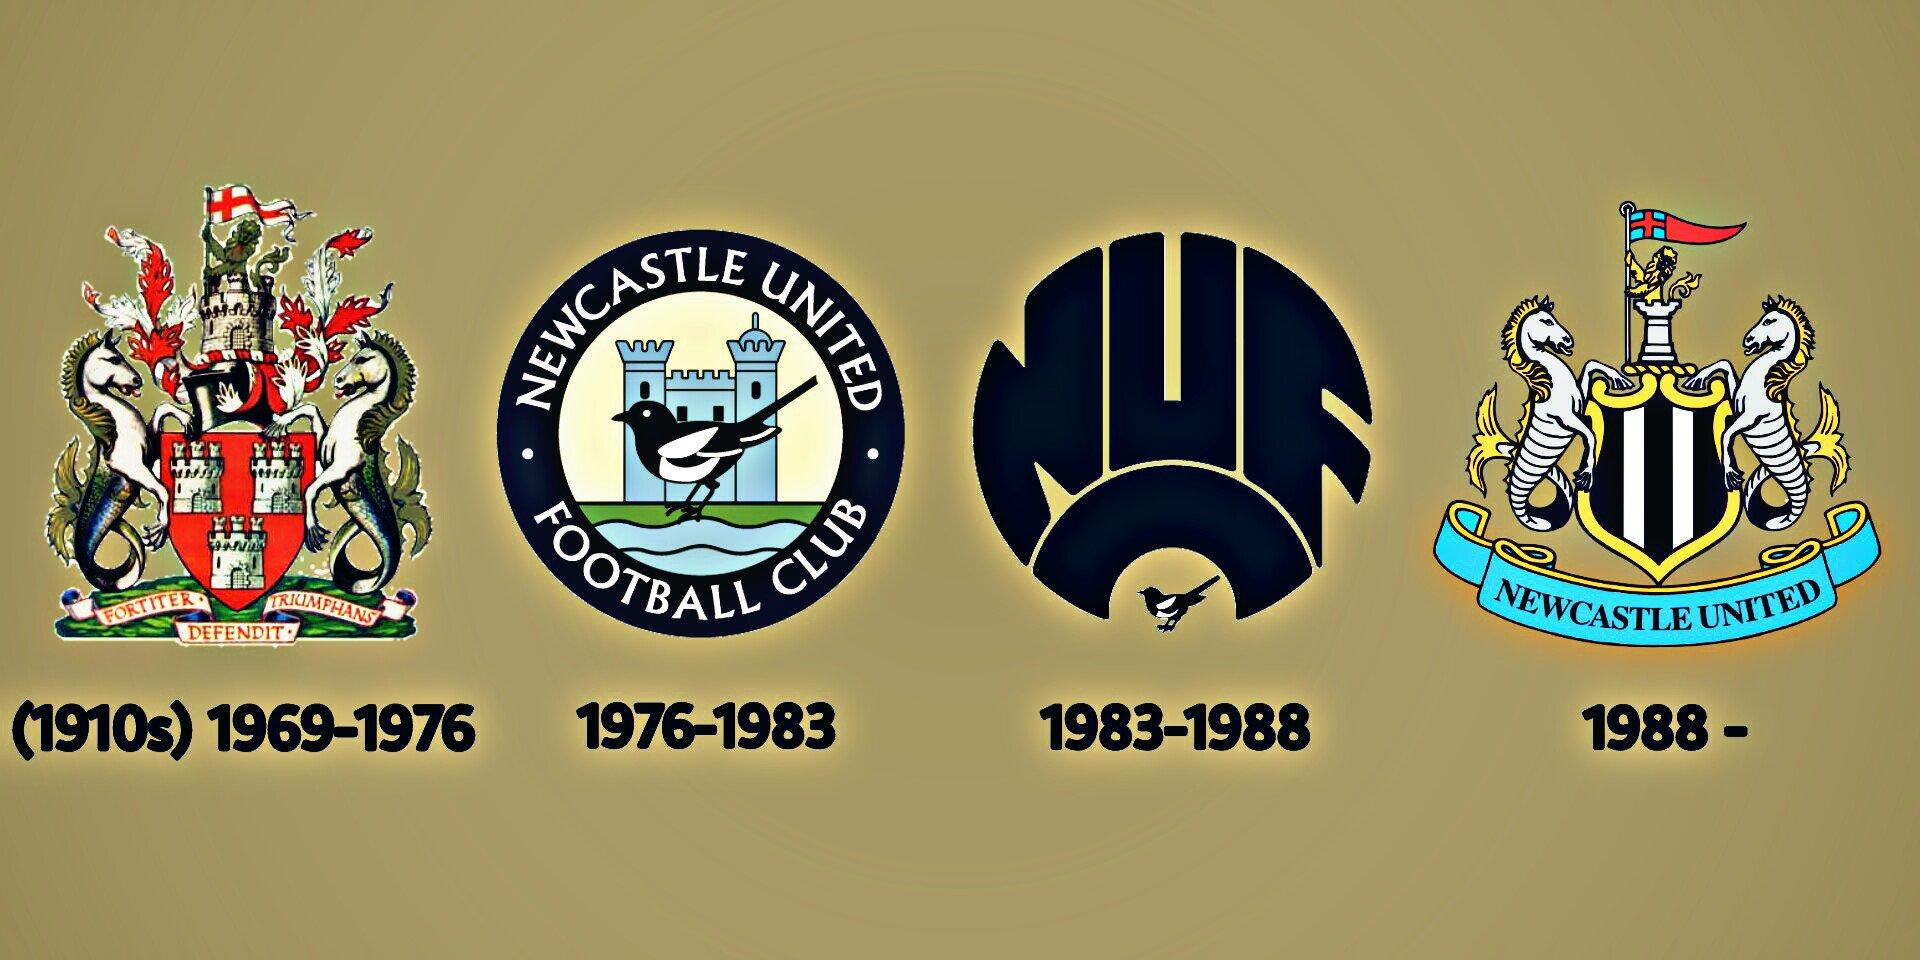 "S, m, l, xl, 2xl. Newcastle Utd Turkey on Twitter: ""@NUFC Badge History…"